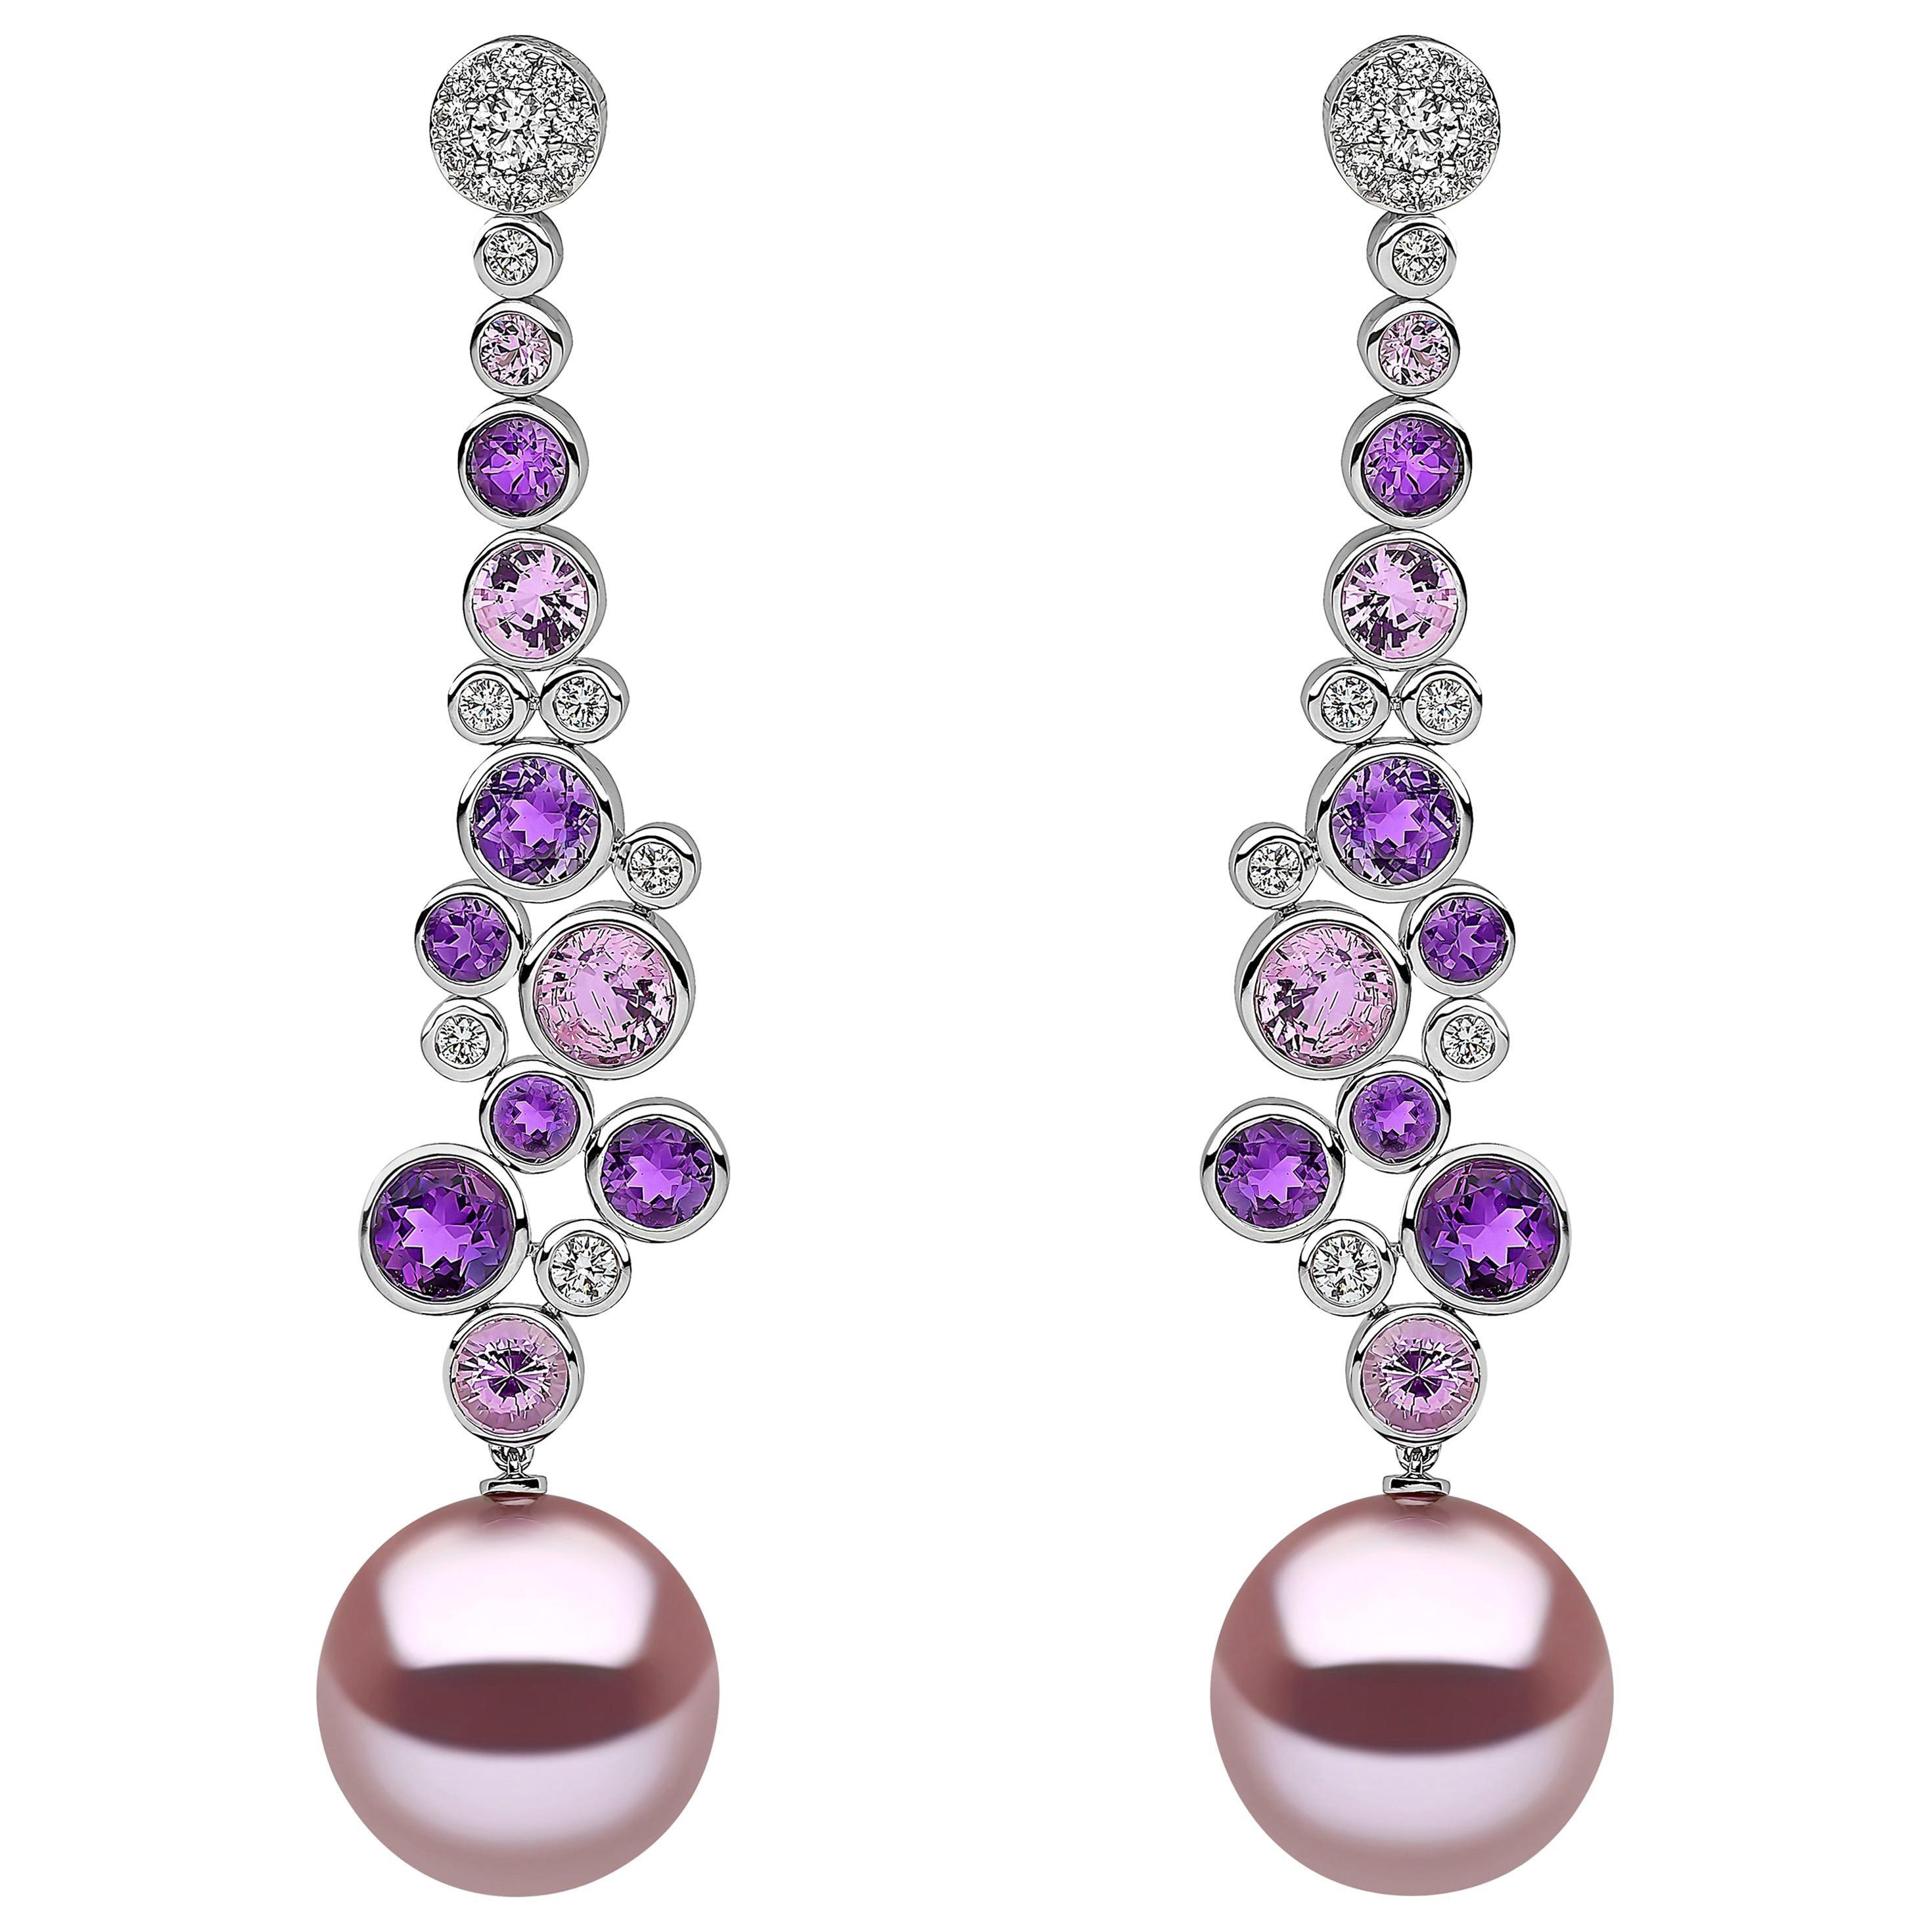 Yoko London Pearl, Diamond, Amethyst and Pink Sapphire Earrings in 18 Karat Gold